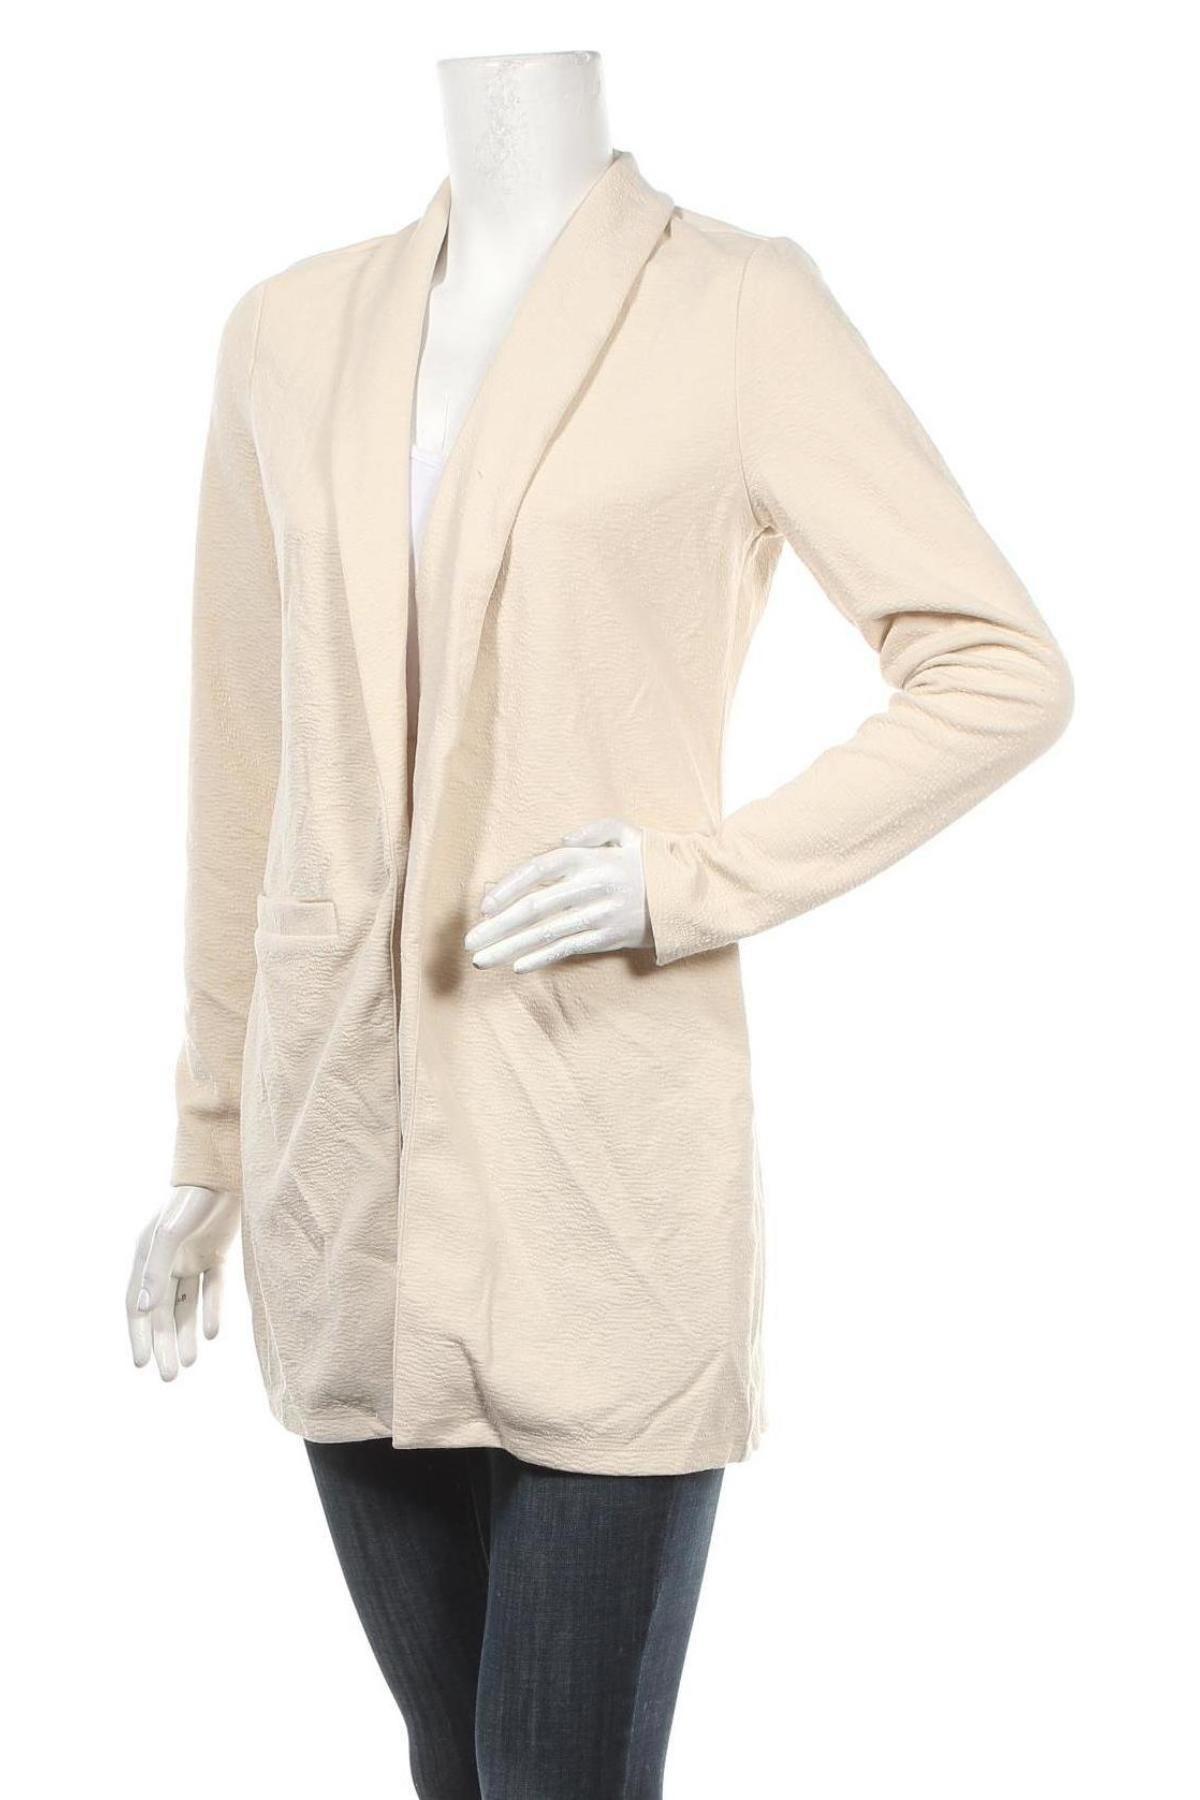 Дамско сако Vero Moda, Размер S, Цвят Бежов, 96% полиестер, 4% еластан, Цена 19,00лв.